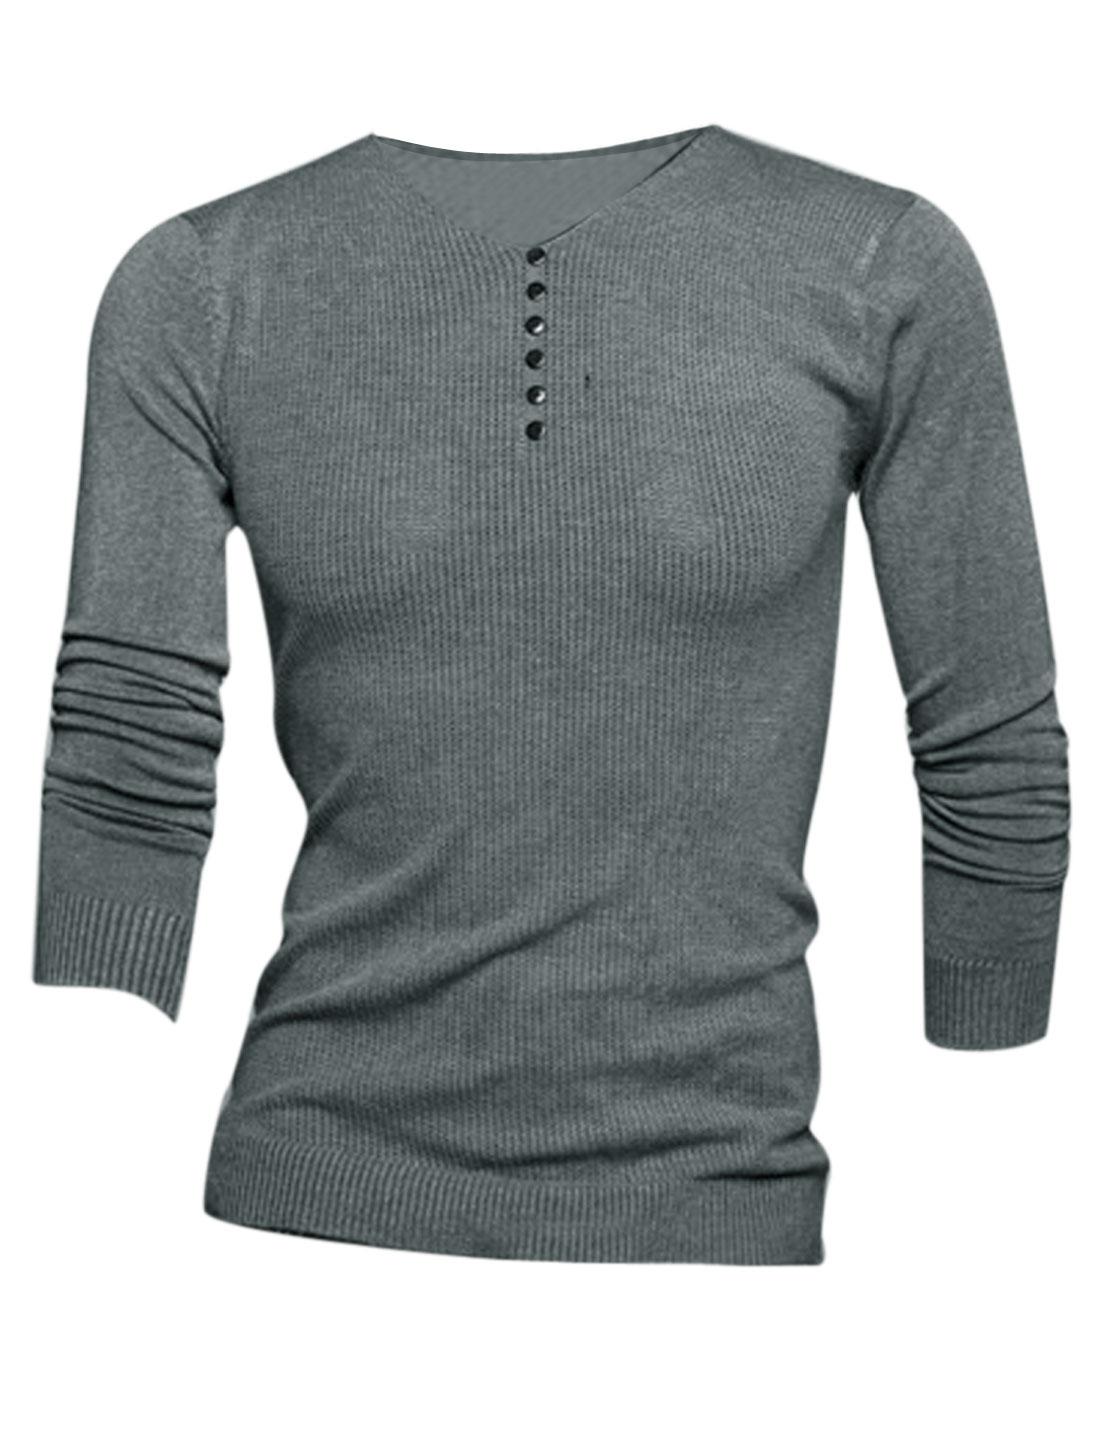 Men V Neck Long Sleeve Buttons Decor Front Stylish Knit Shirt Dark Gray S